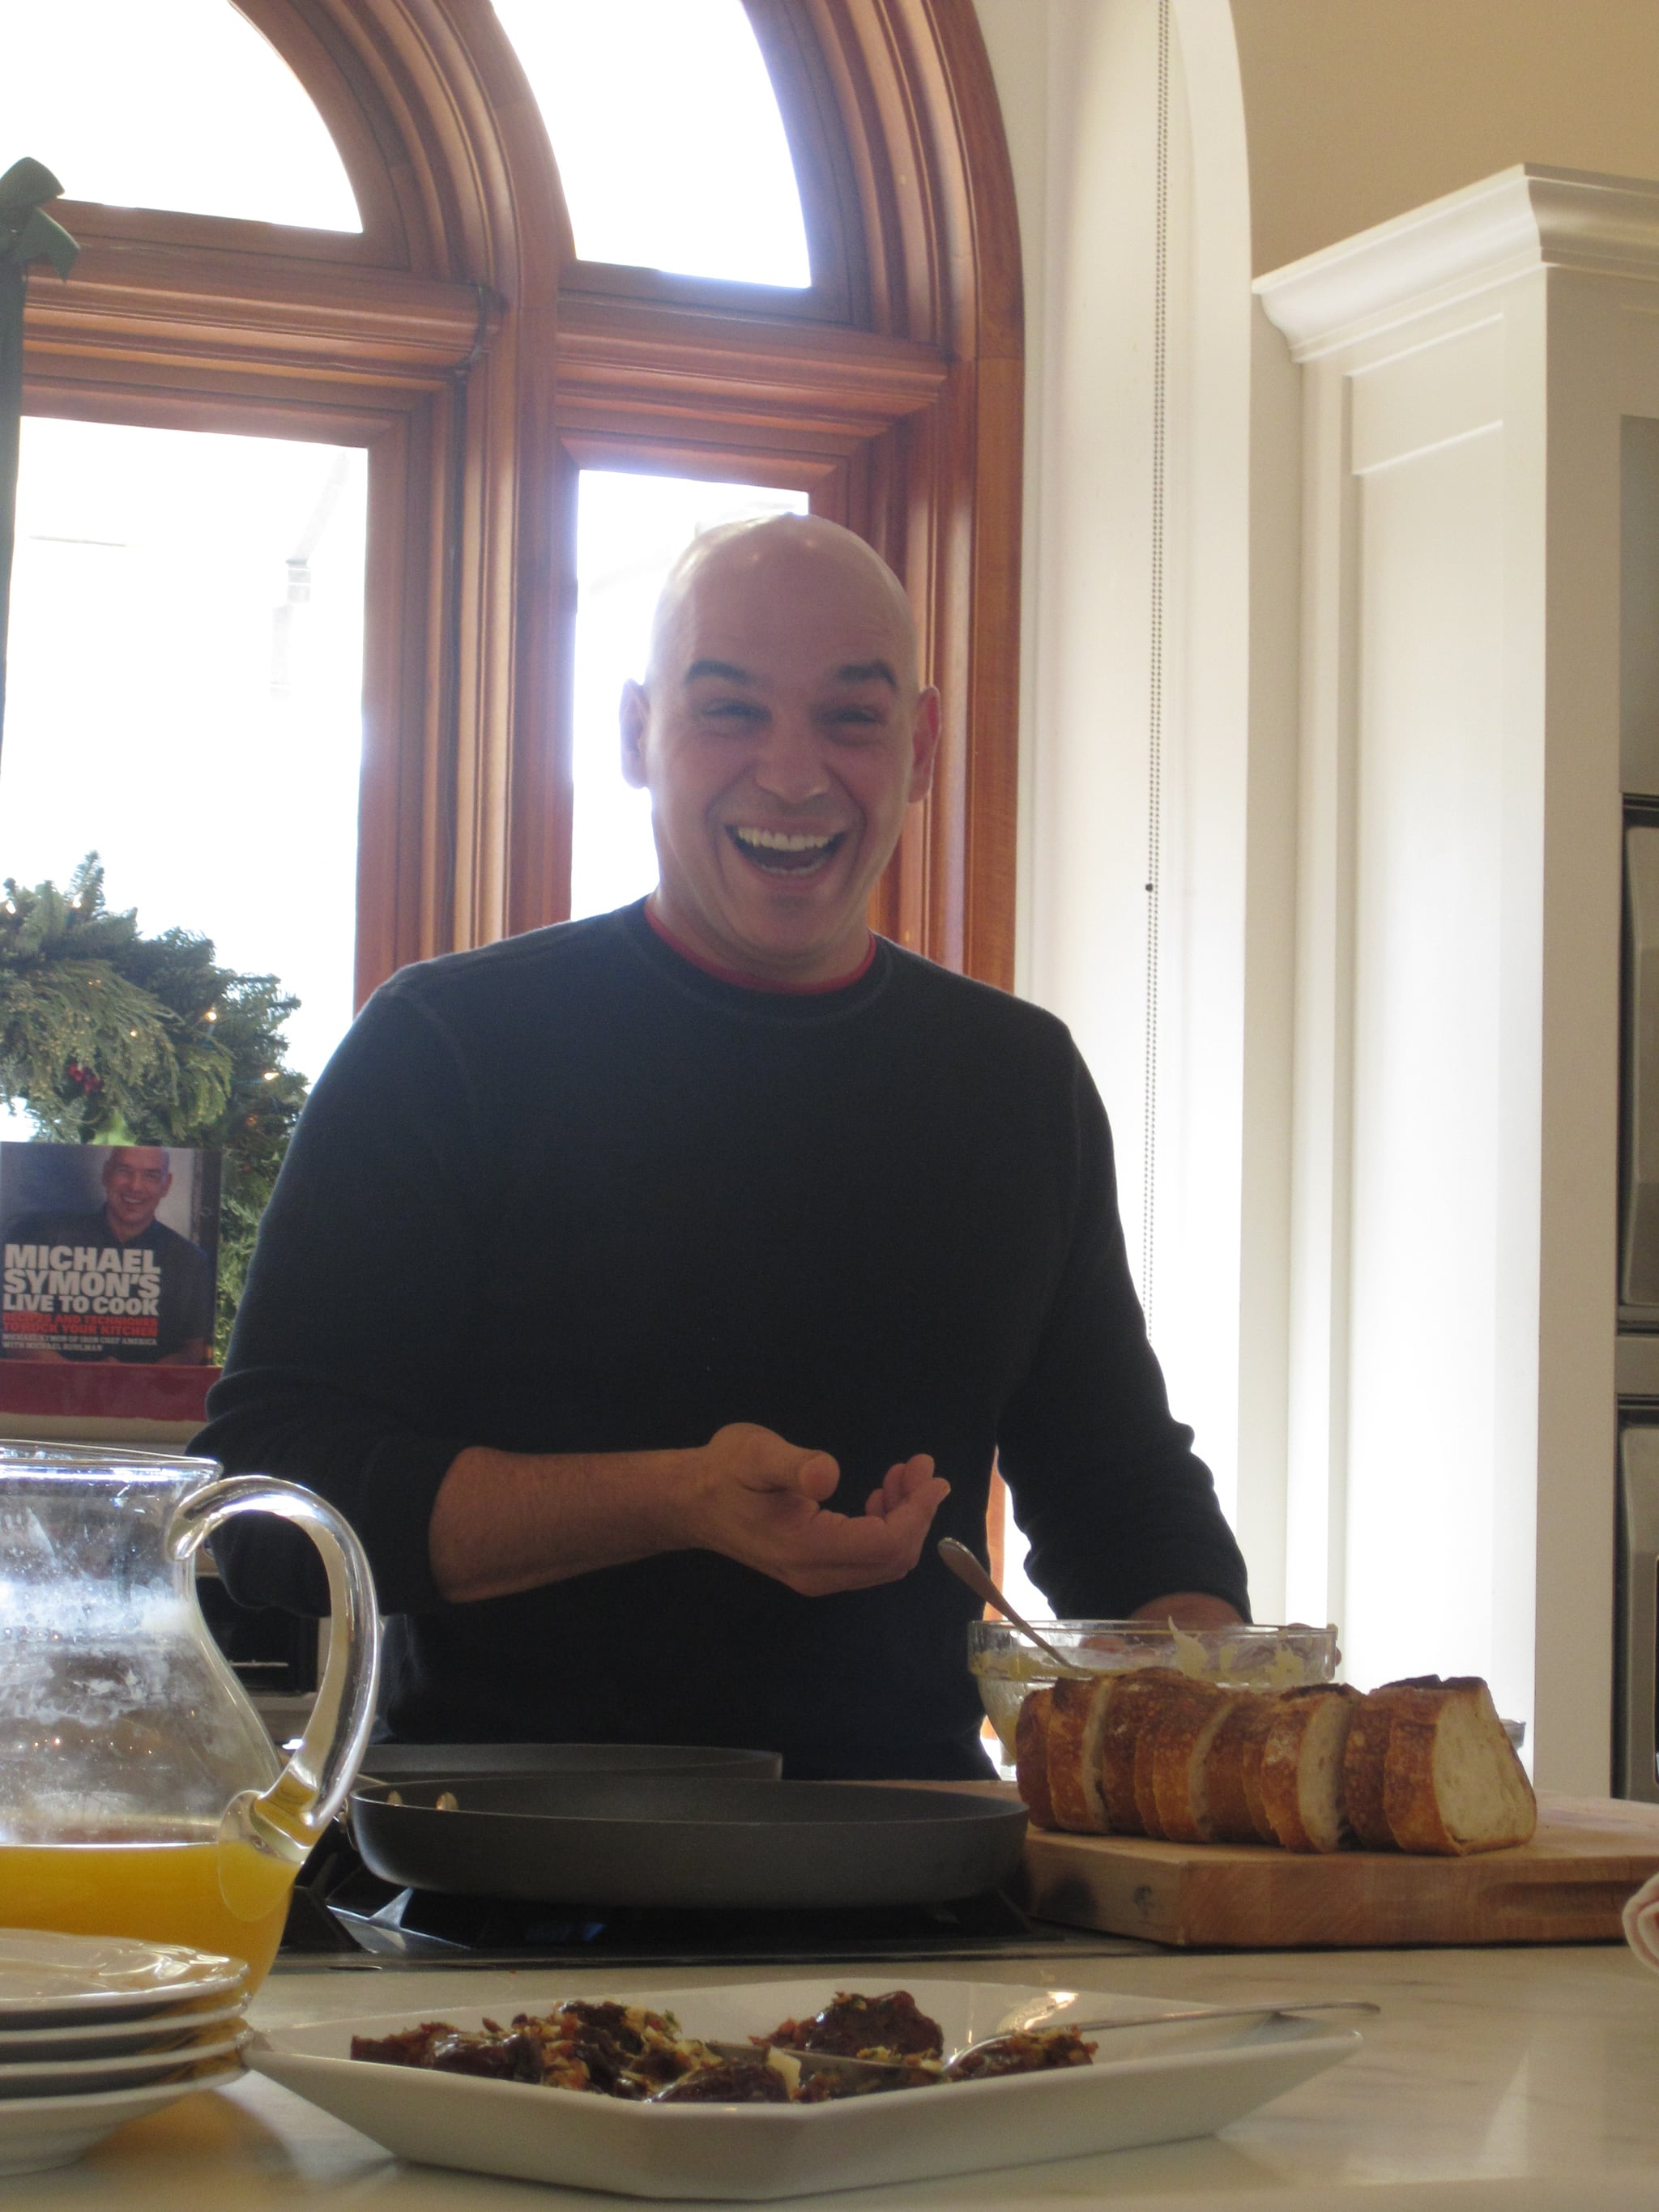 Michael Symon Makes Breakfast at Williams-Sonoma in San Francisco